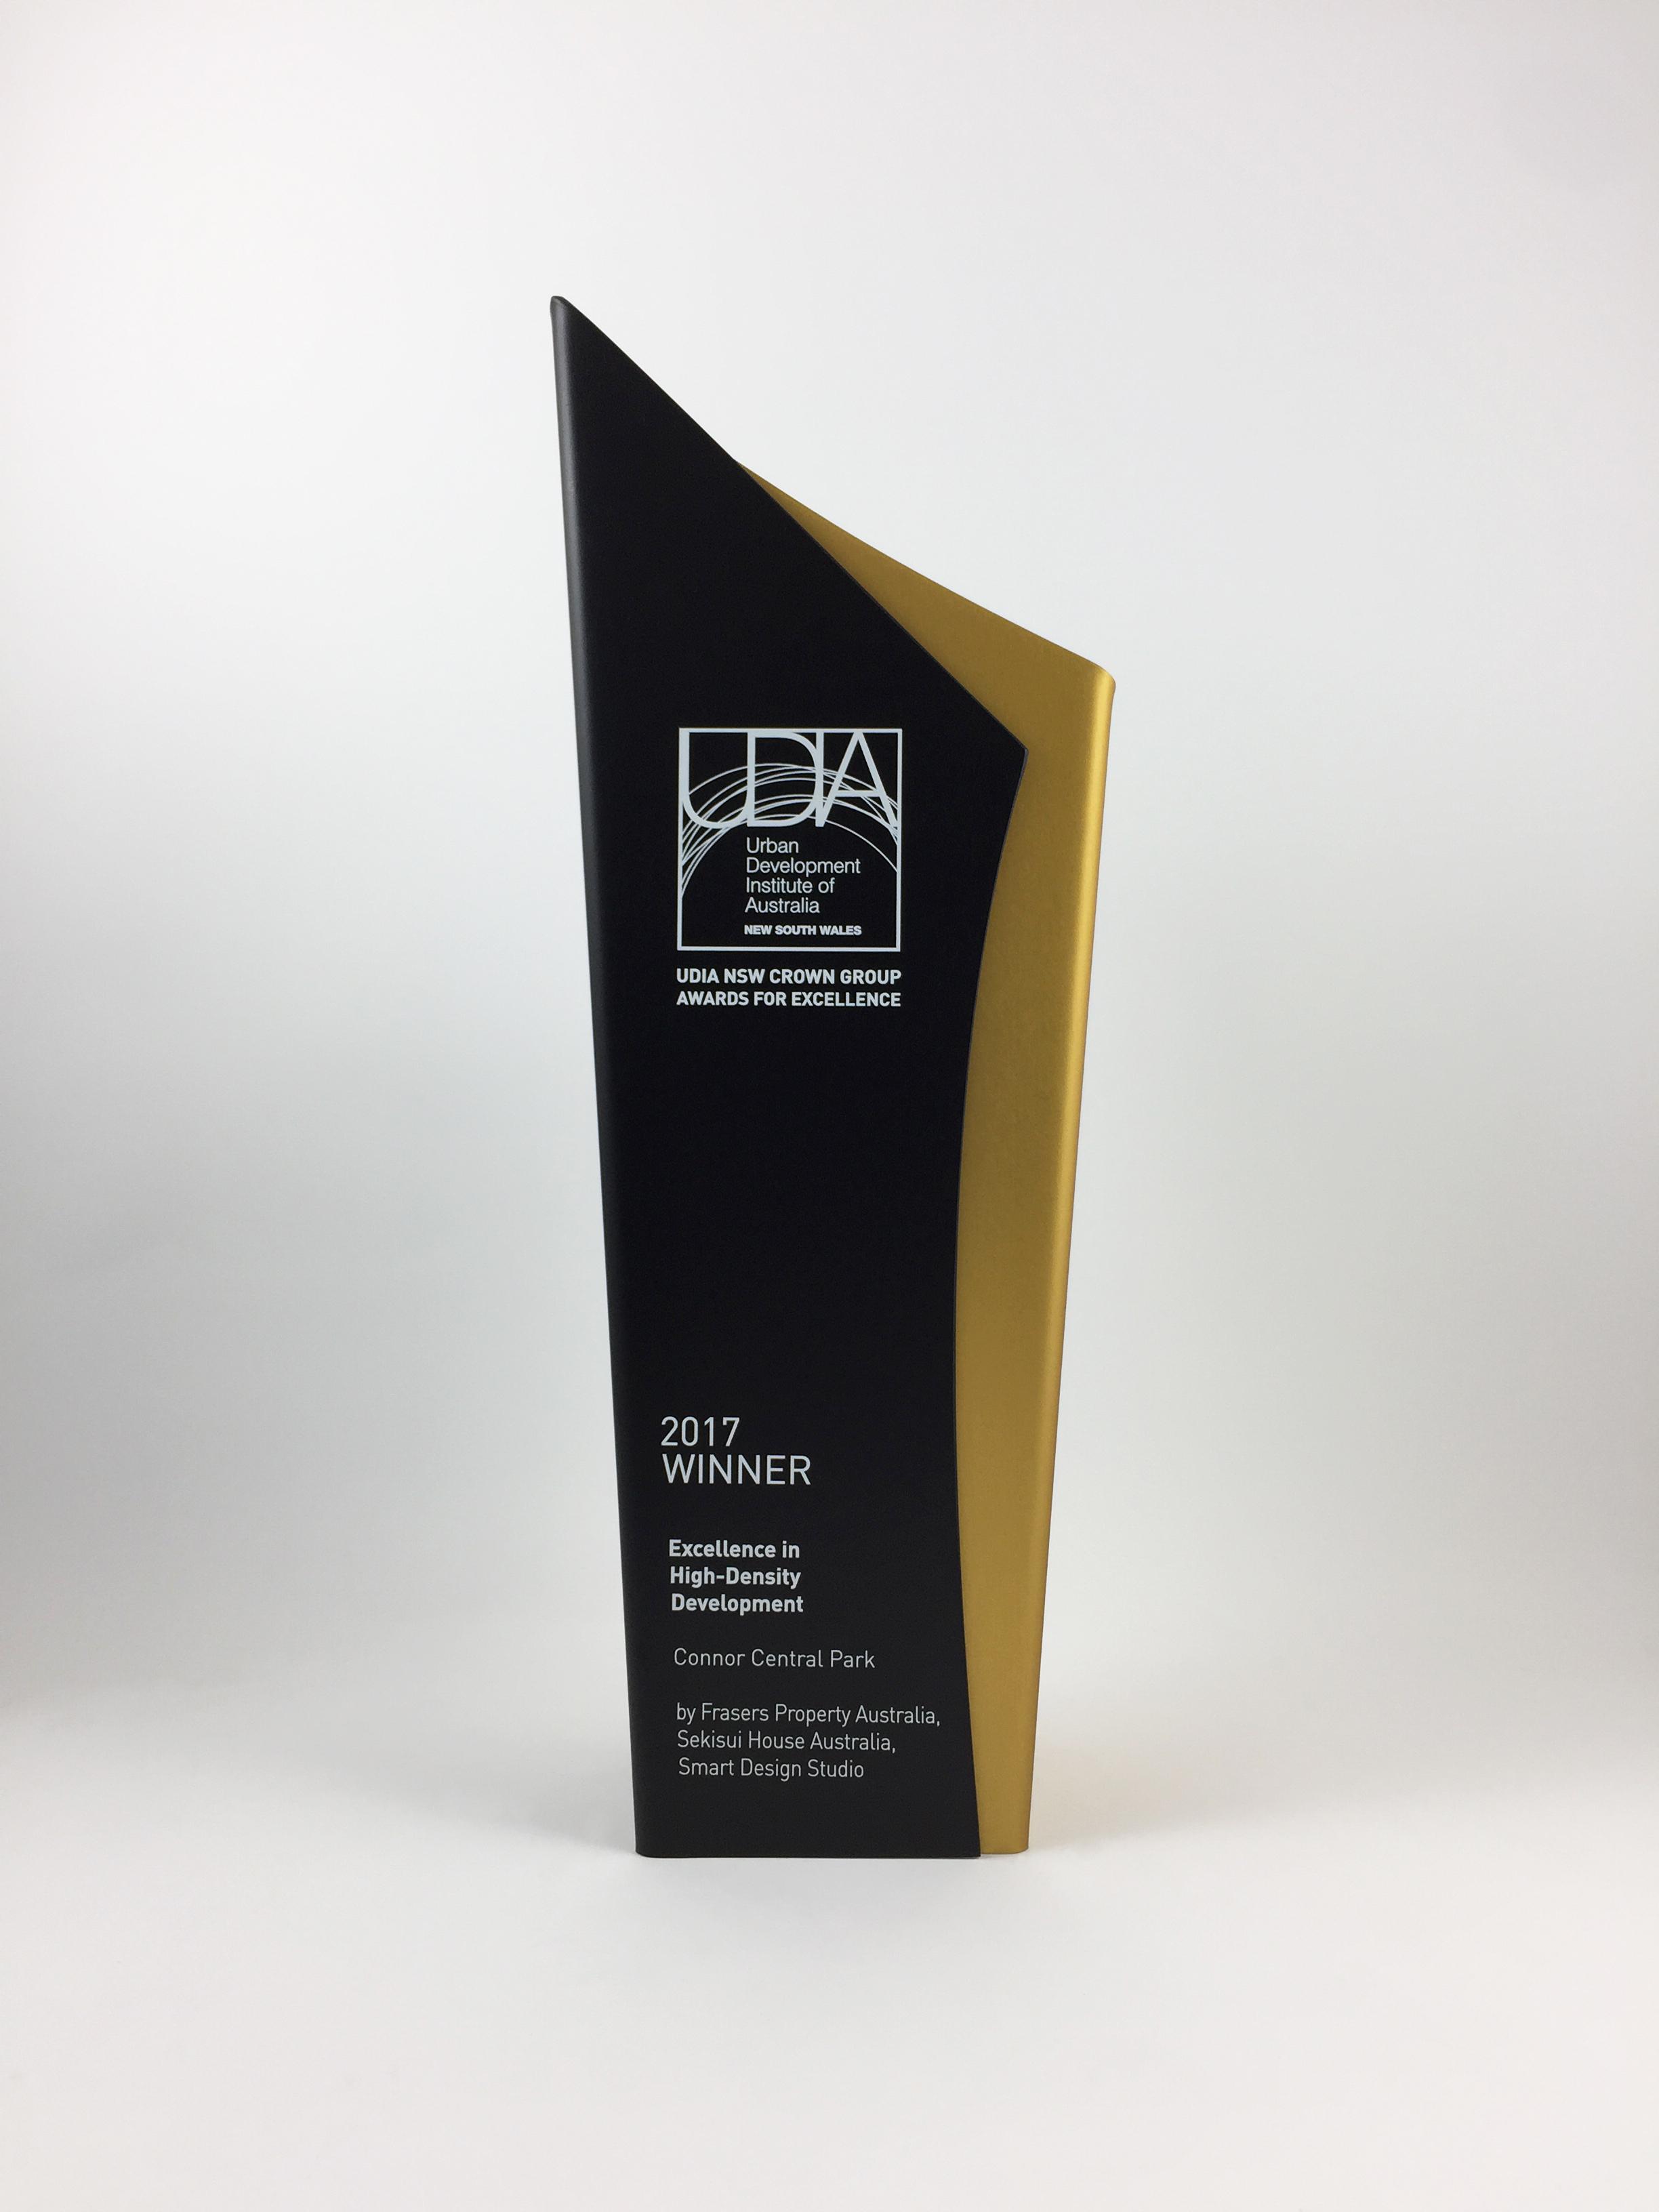 udia-nsw-awards-aluminium-trophy-01.jpg